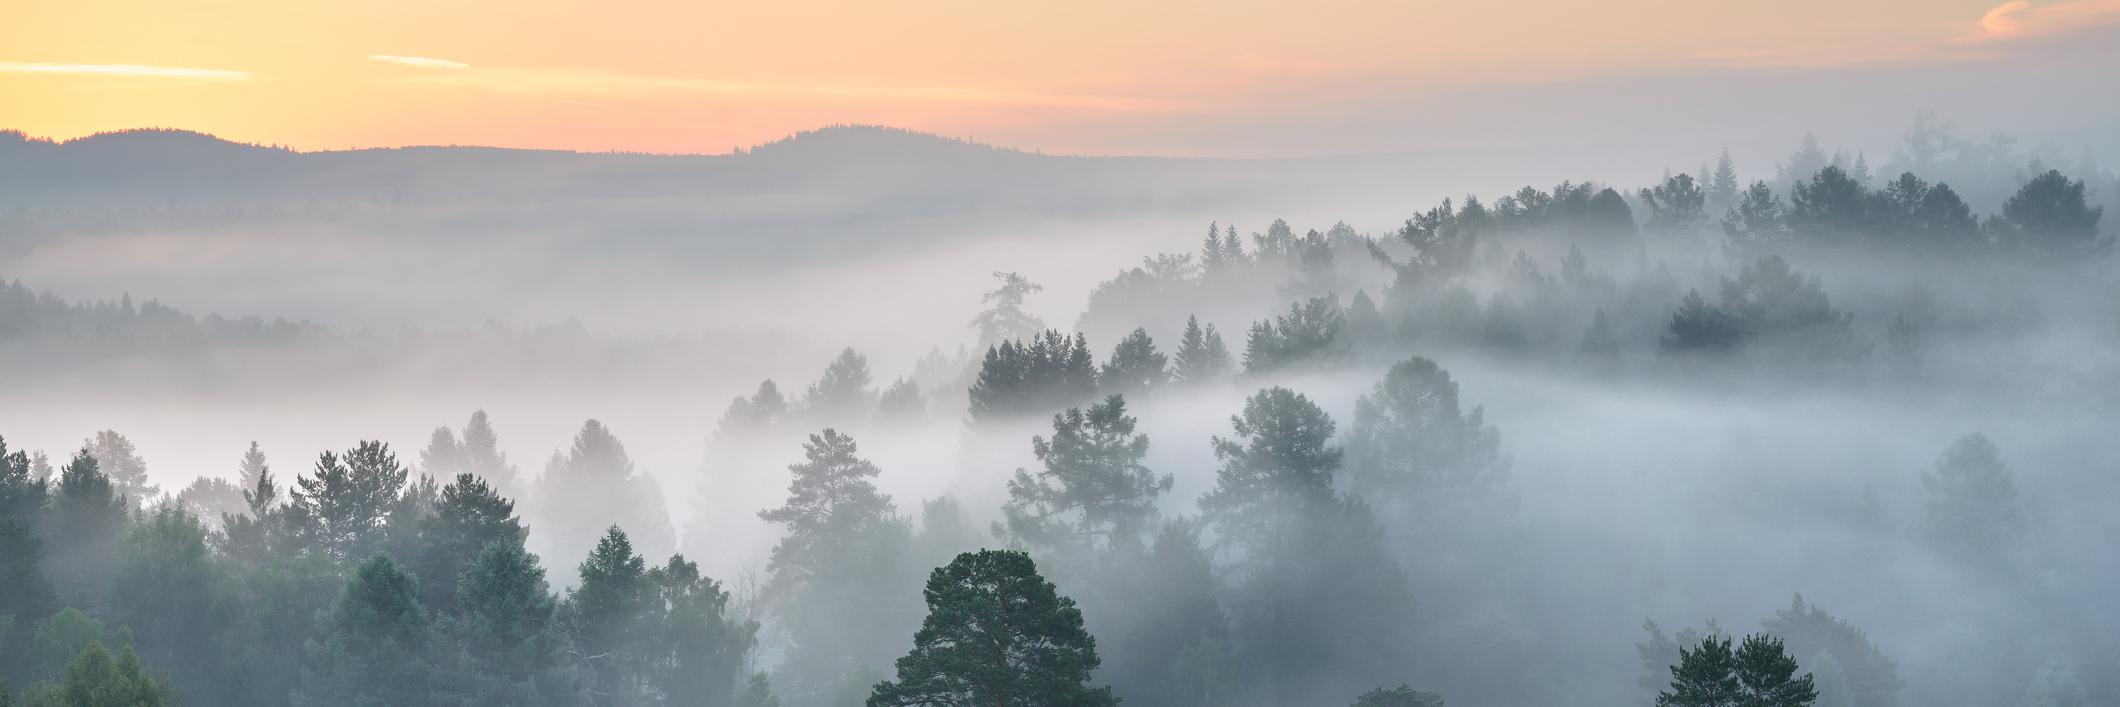 morning fog in forest at sunrise